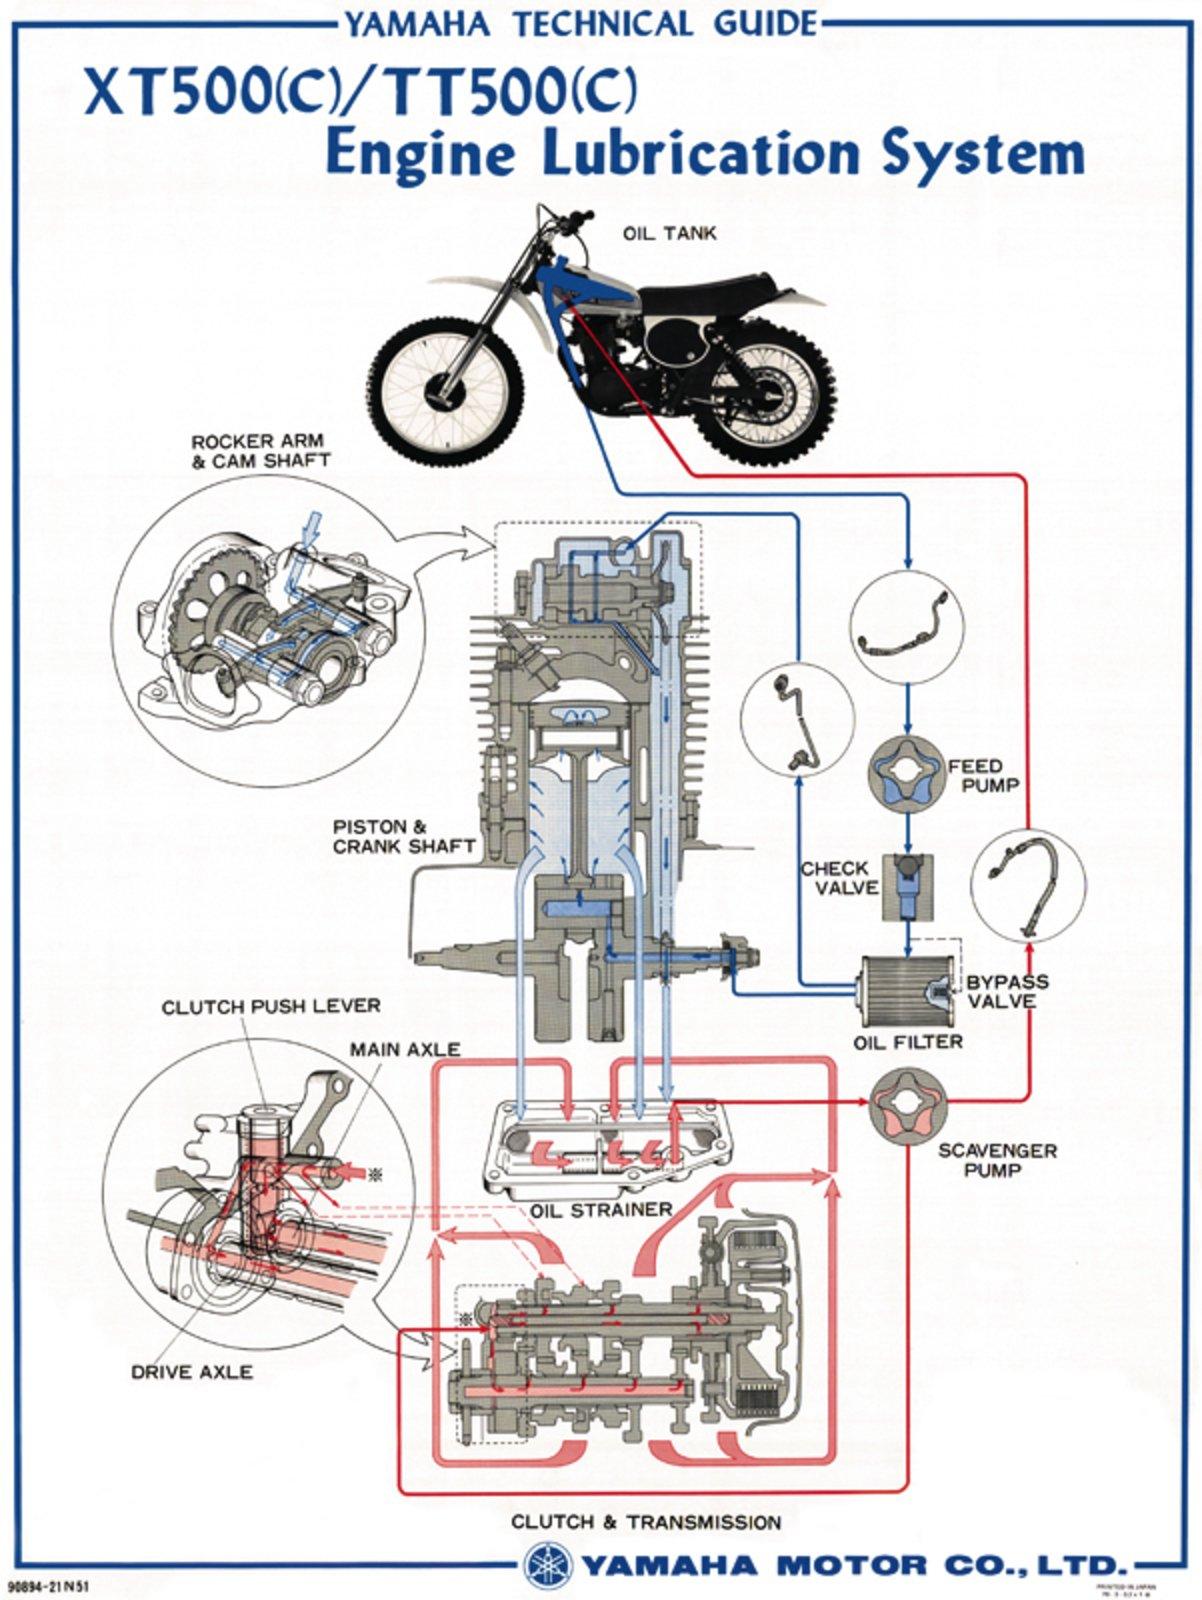 yamaha xt500 tt500 oil circuit vintage poster colorized, approximately  50x70cm 80157